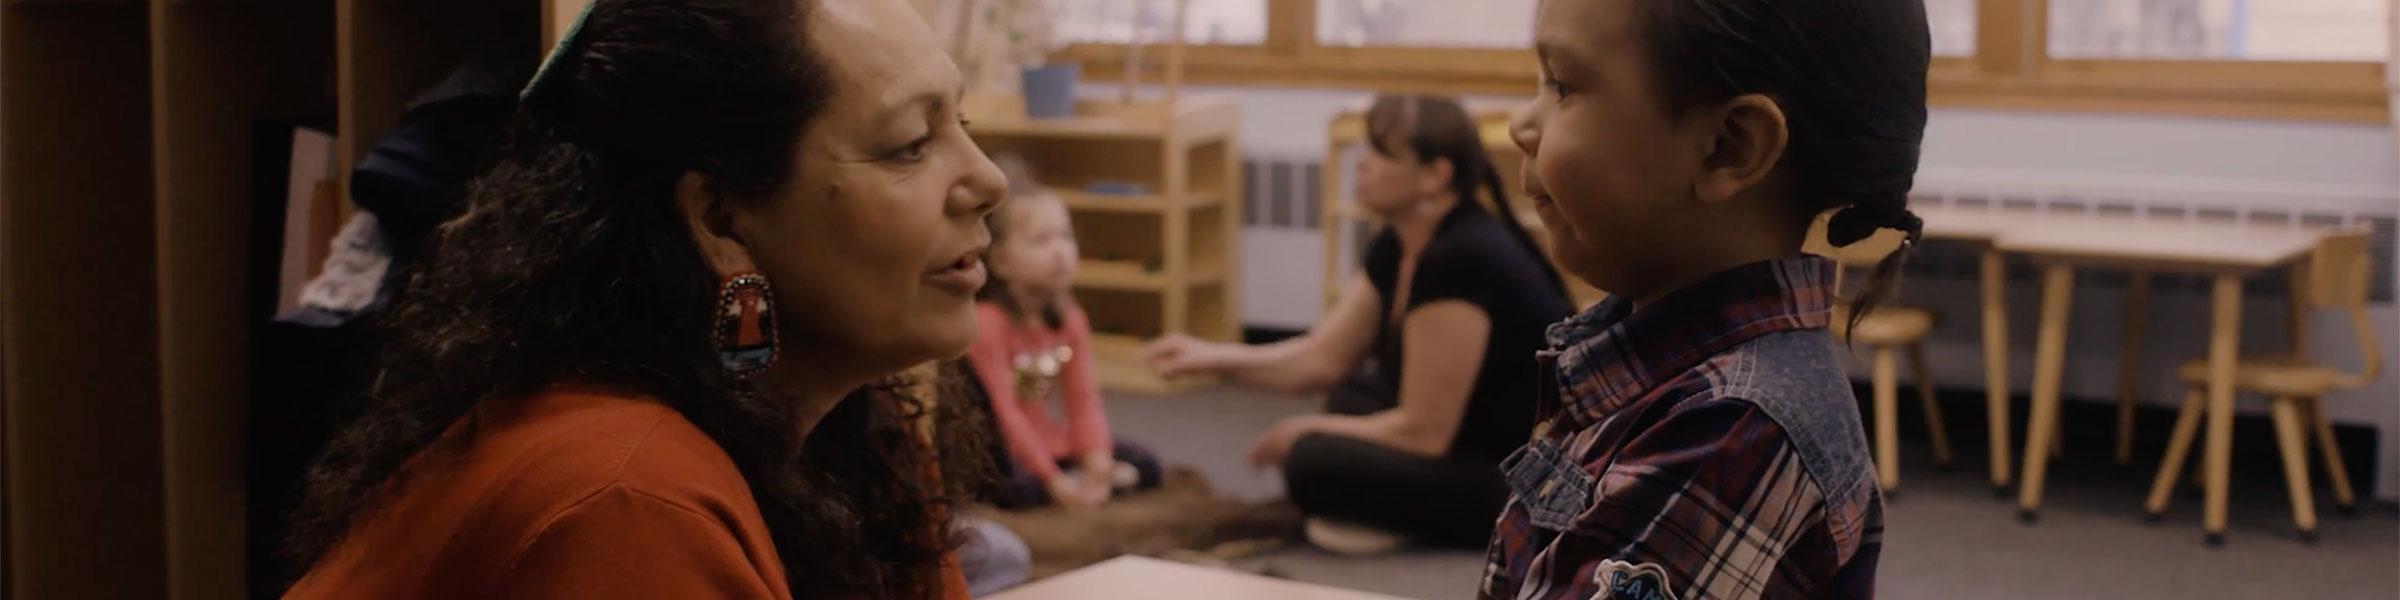 Why become a Montessori teacher?